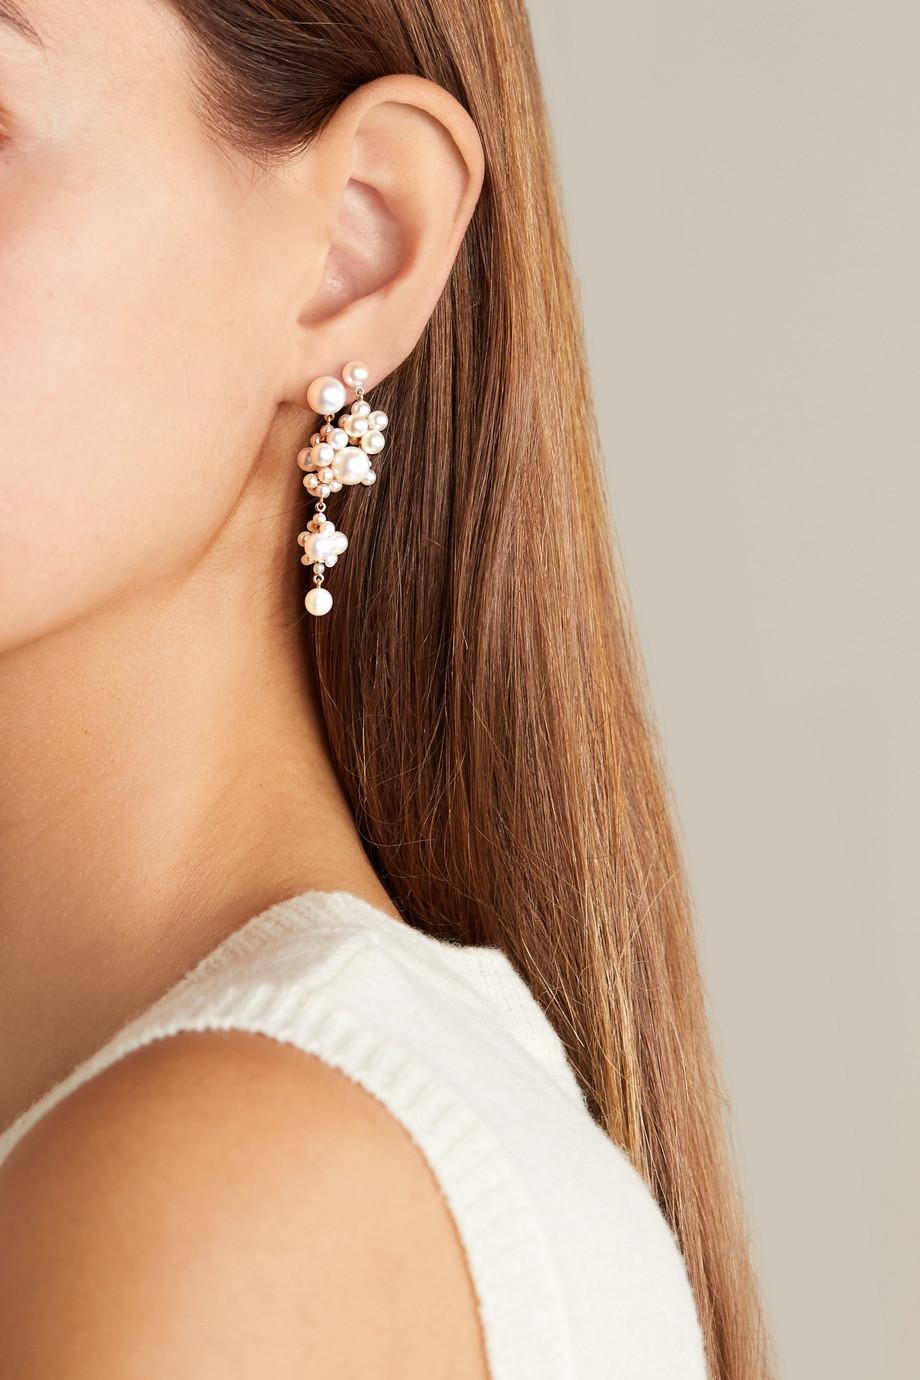 Sophie Bille Brahe Petite Celli 14-karat gold pearl earring